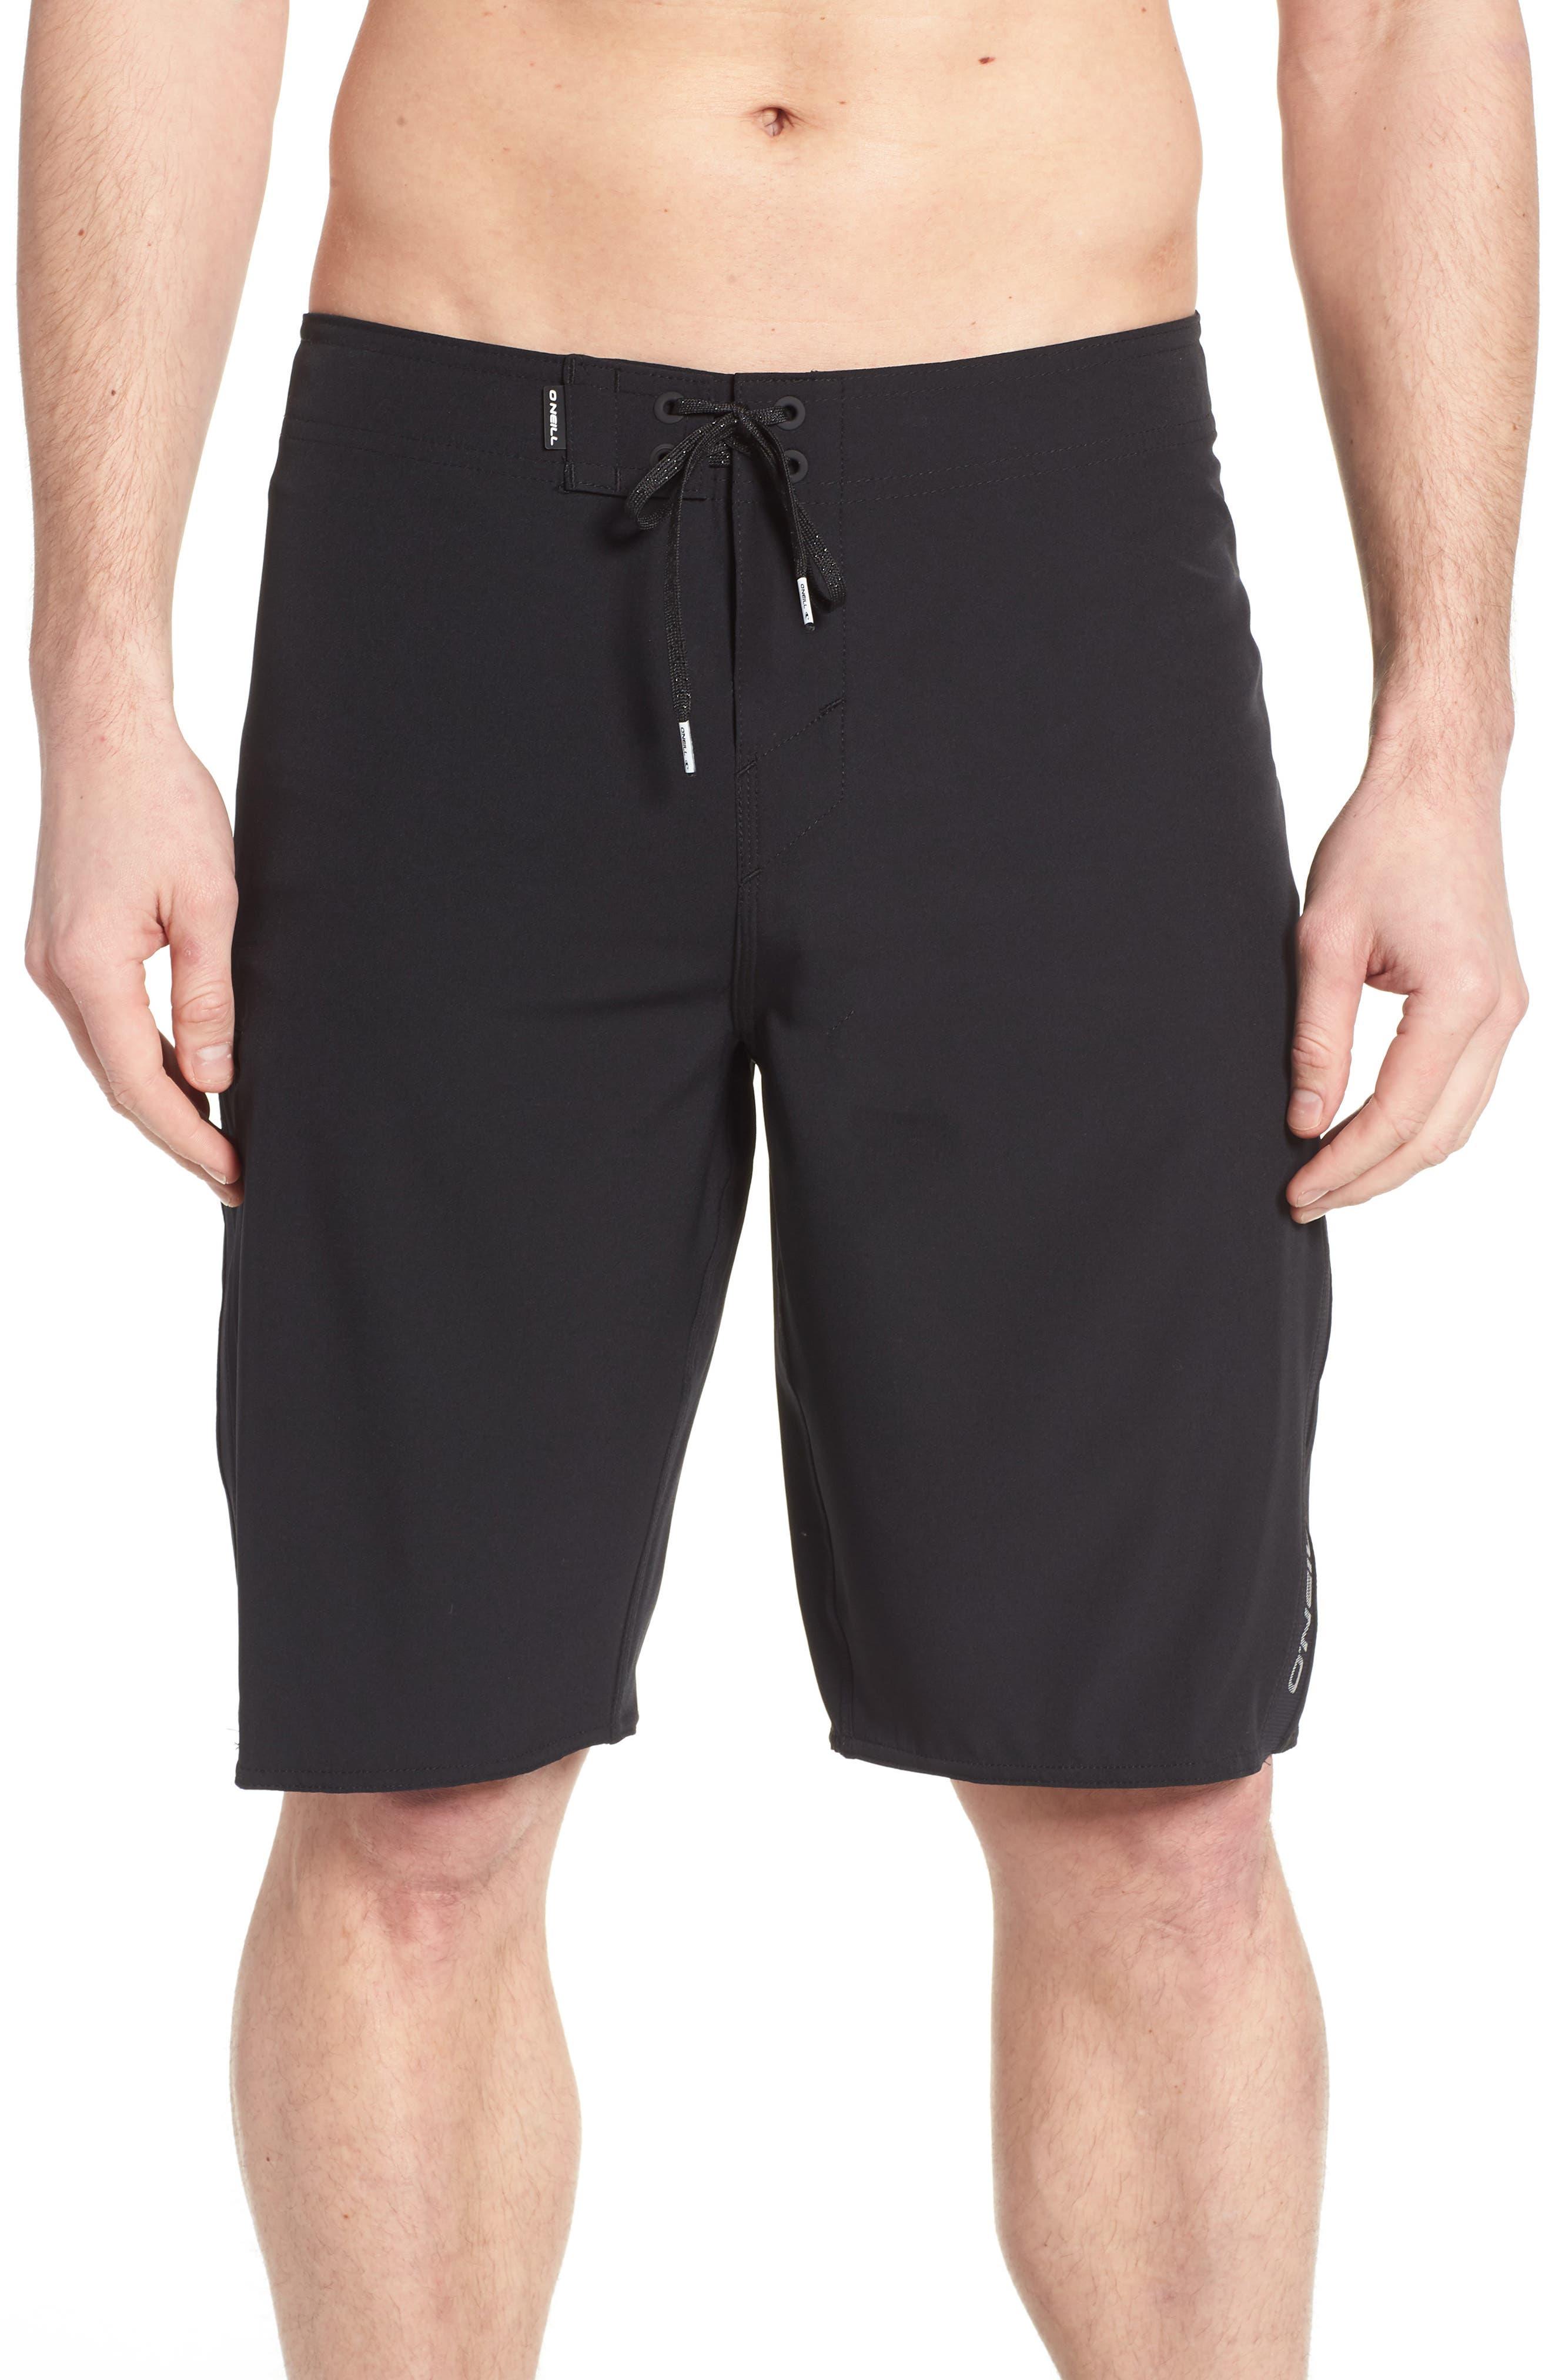 Superfreak Board Shorts,                             Main thumbnail 1, color,                             001